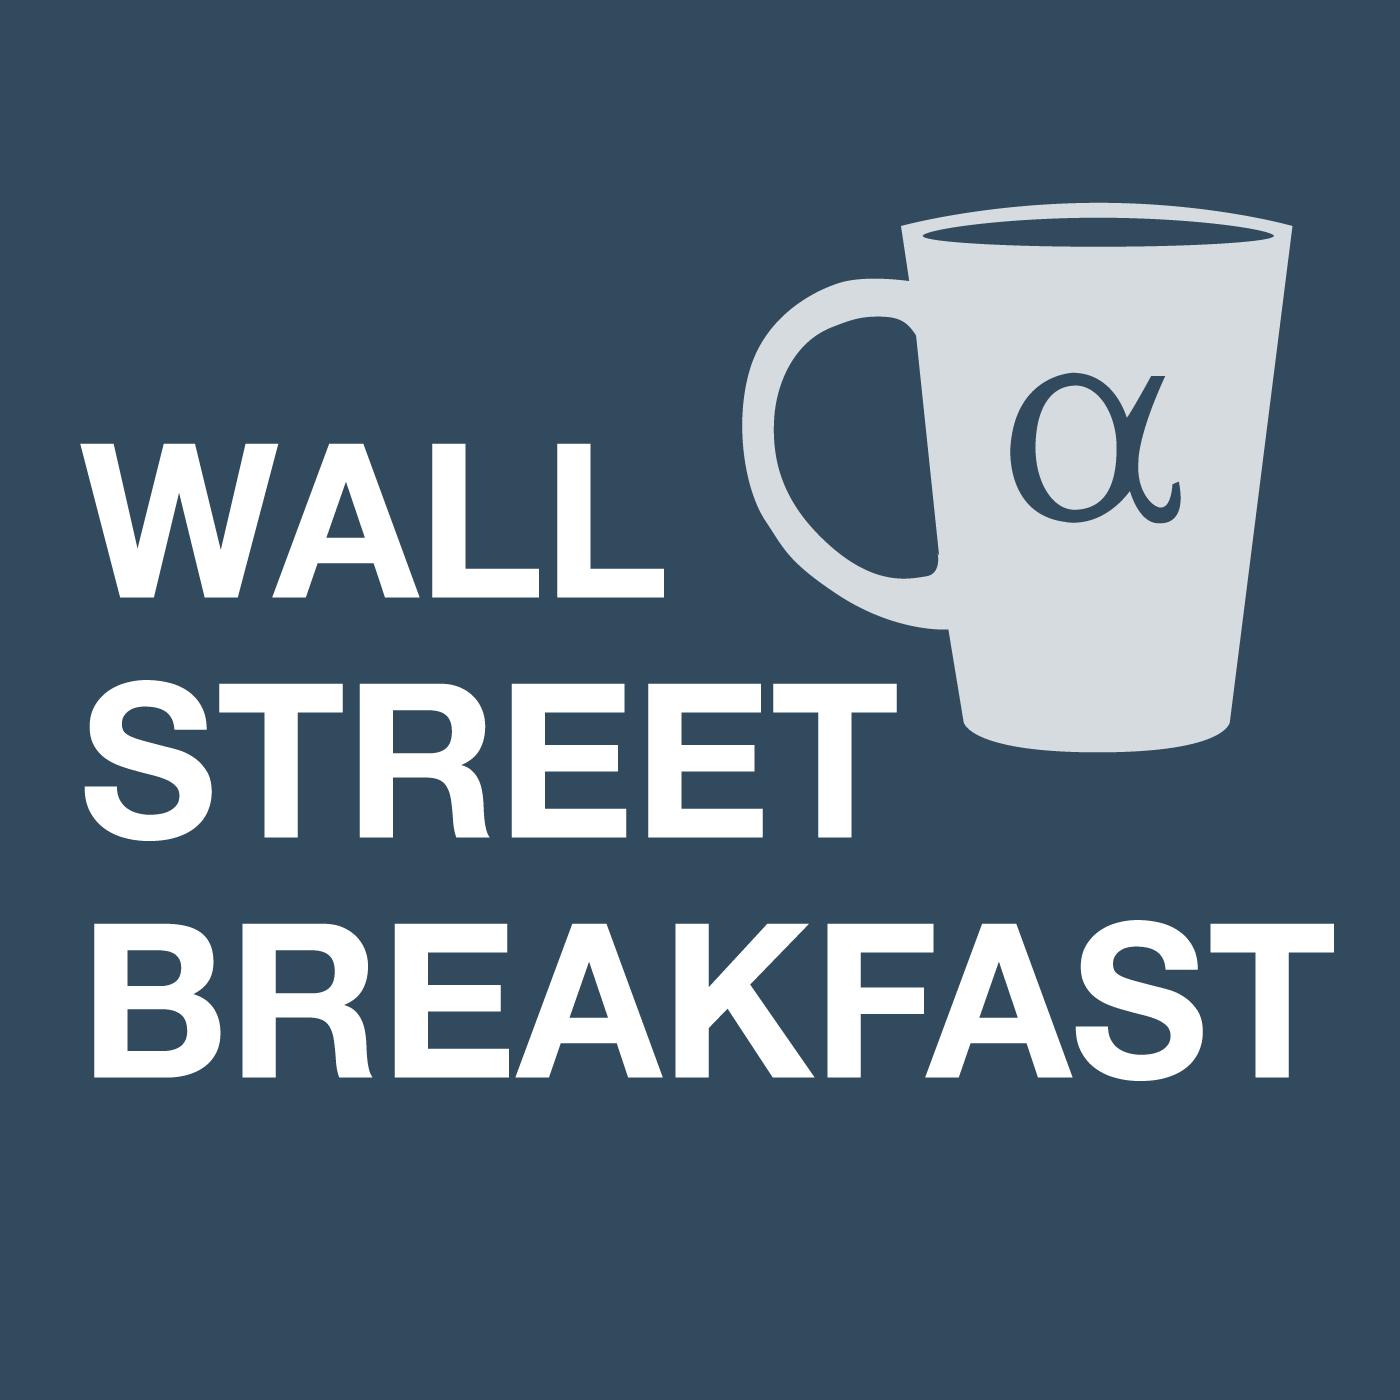 Wall Street Breakfast April 25: Apple, Tesla And Microsoft Lead Huge Earnings Week